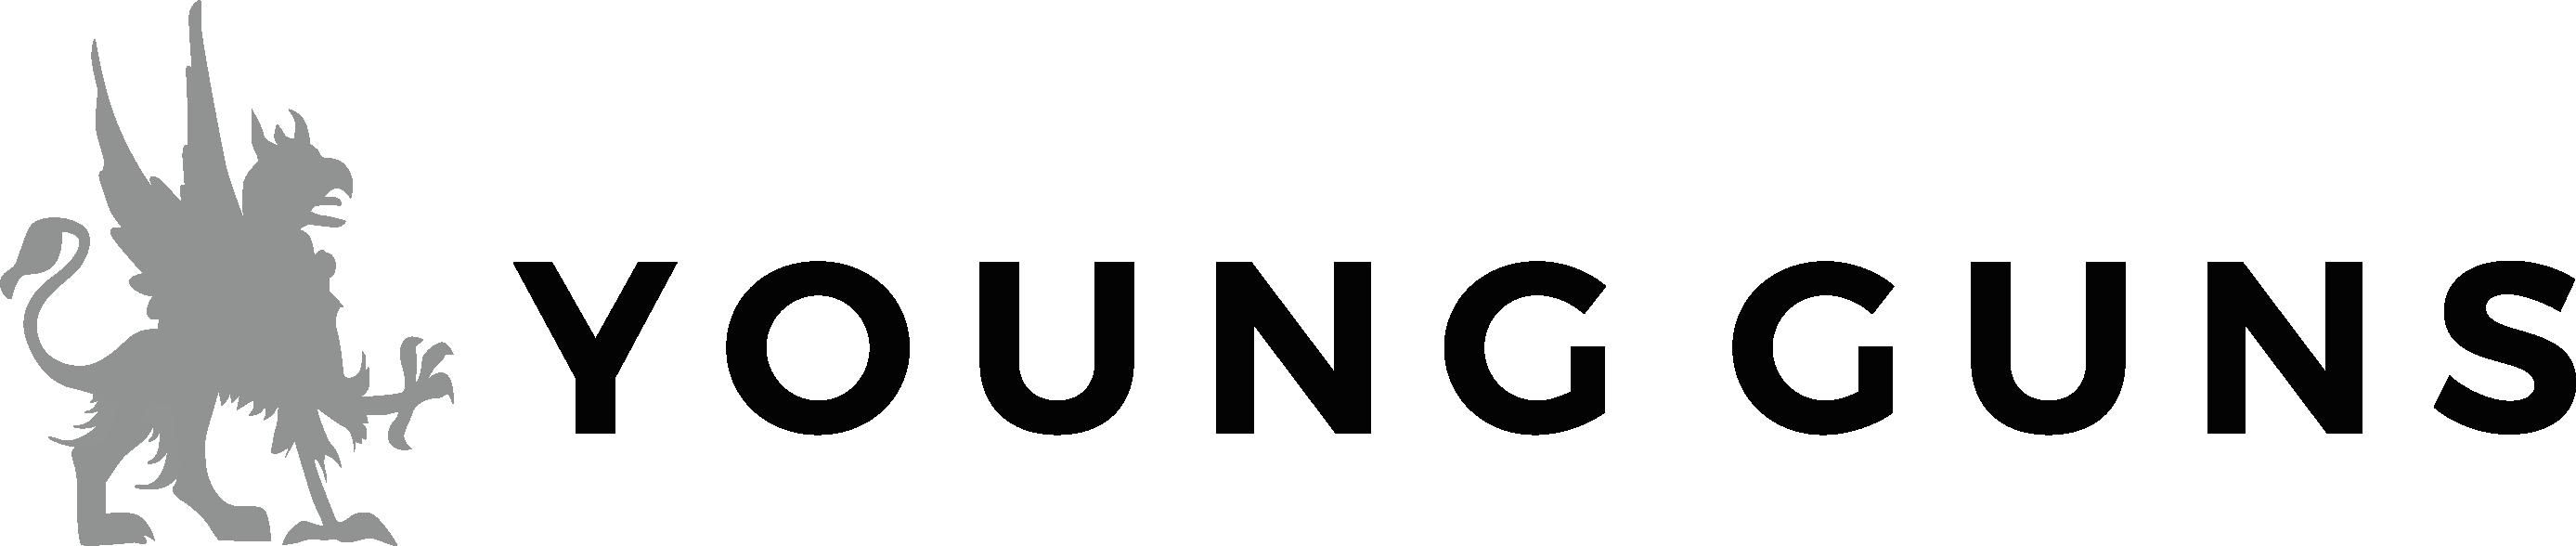 YG new logo